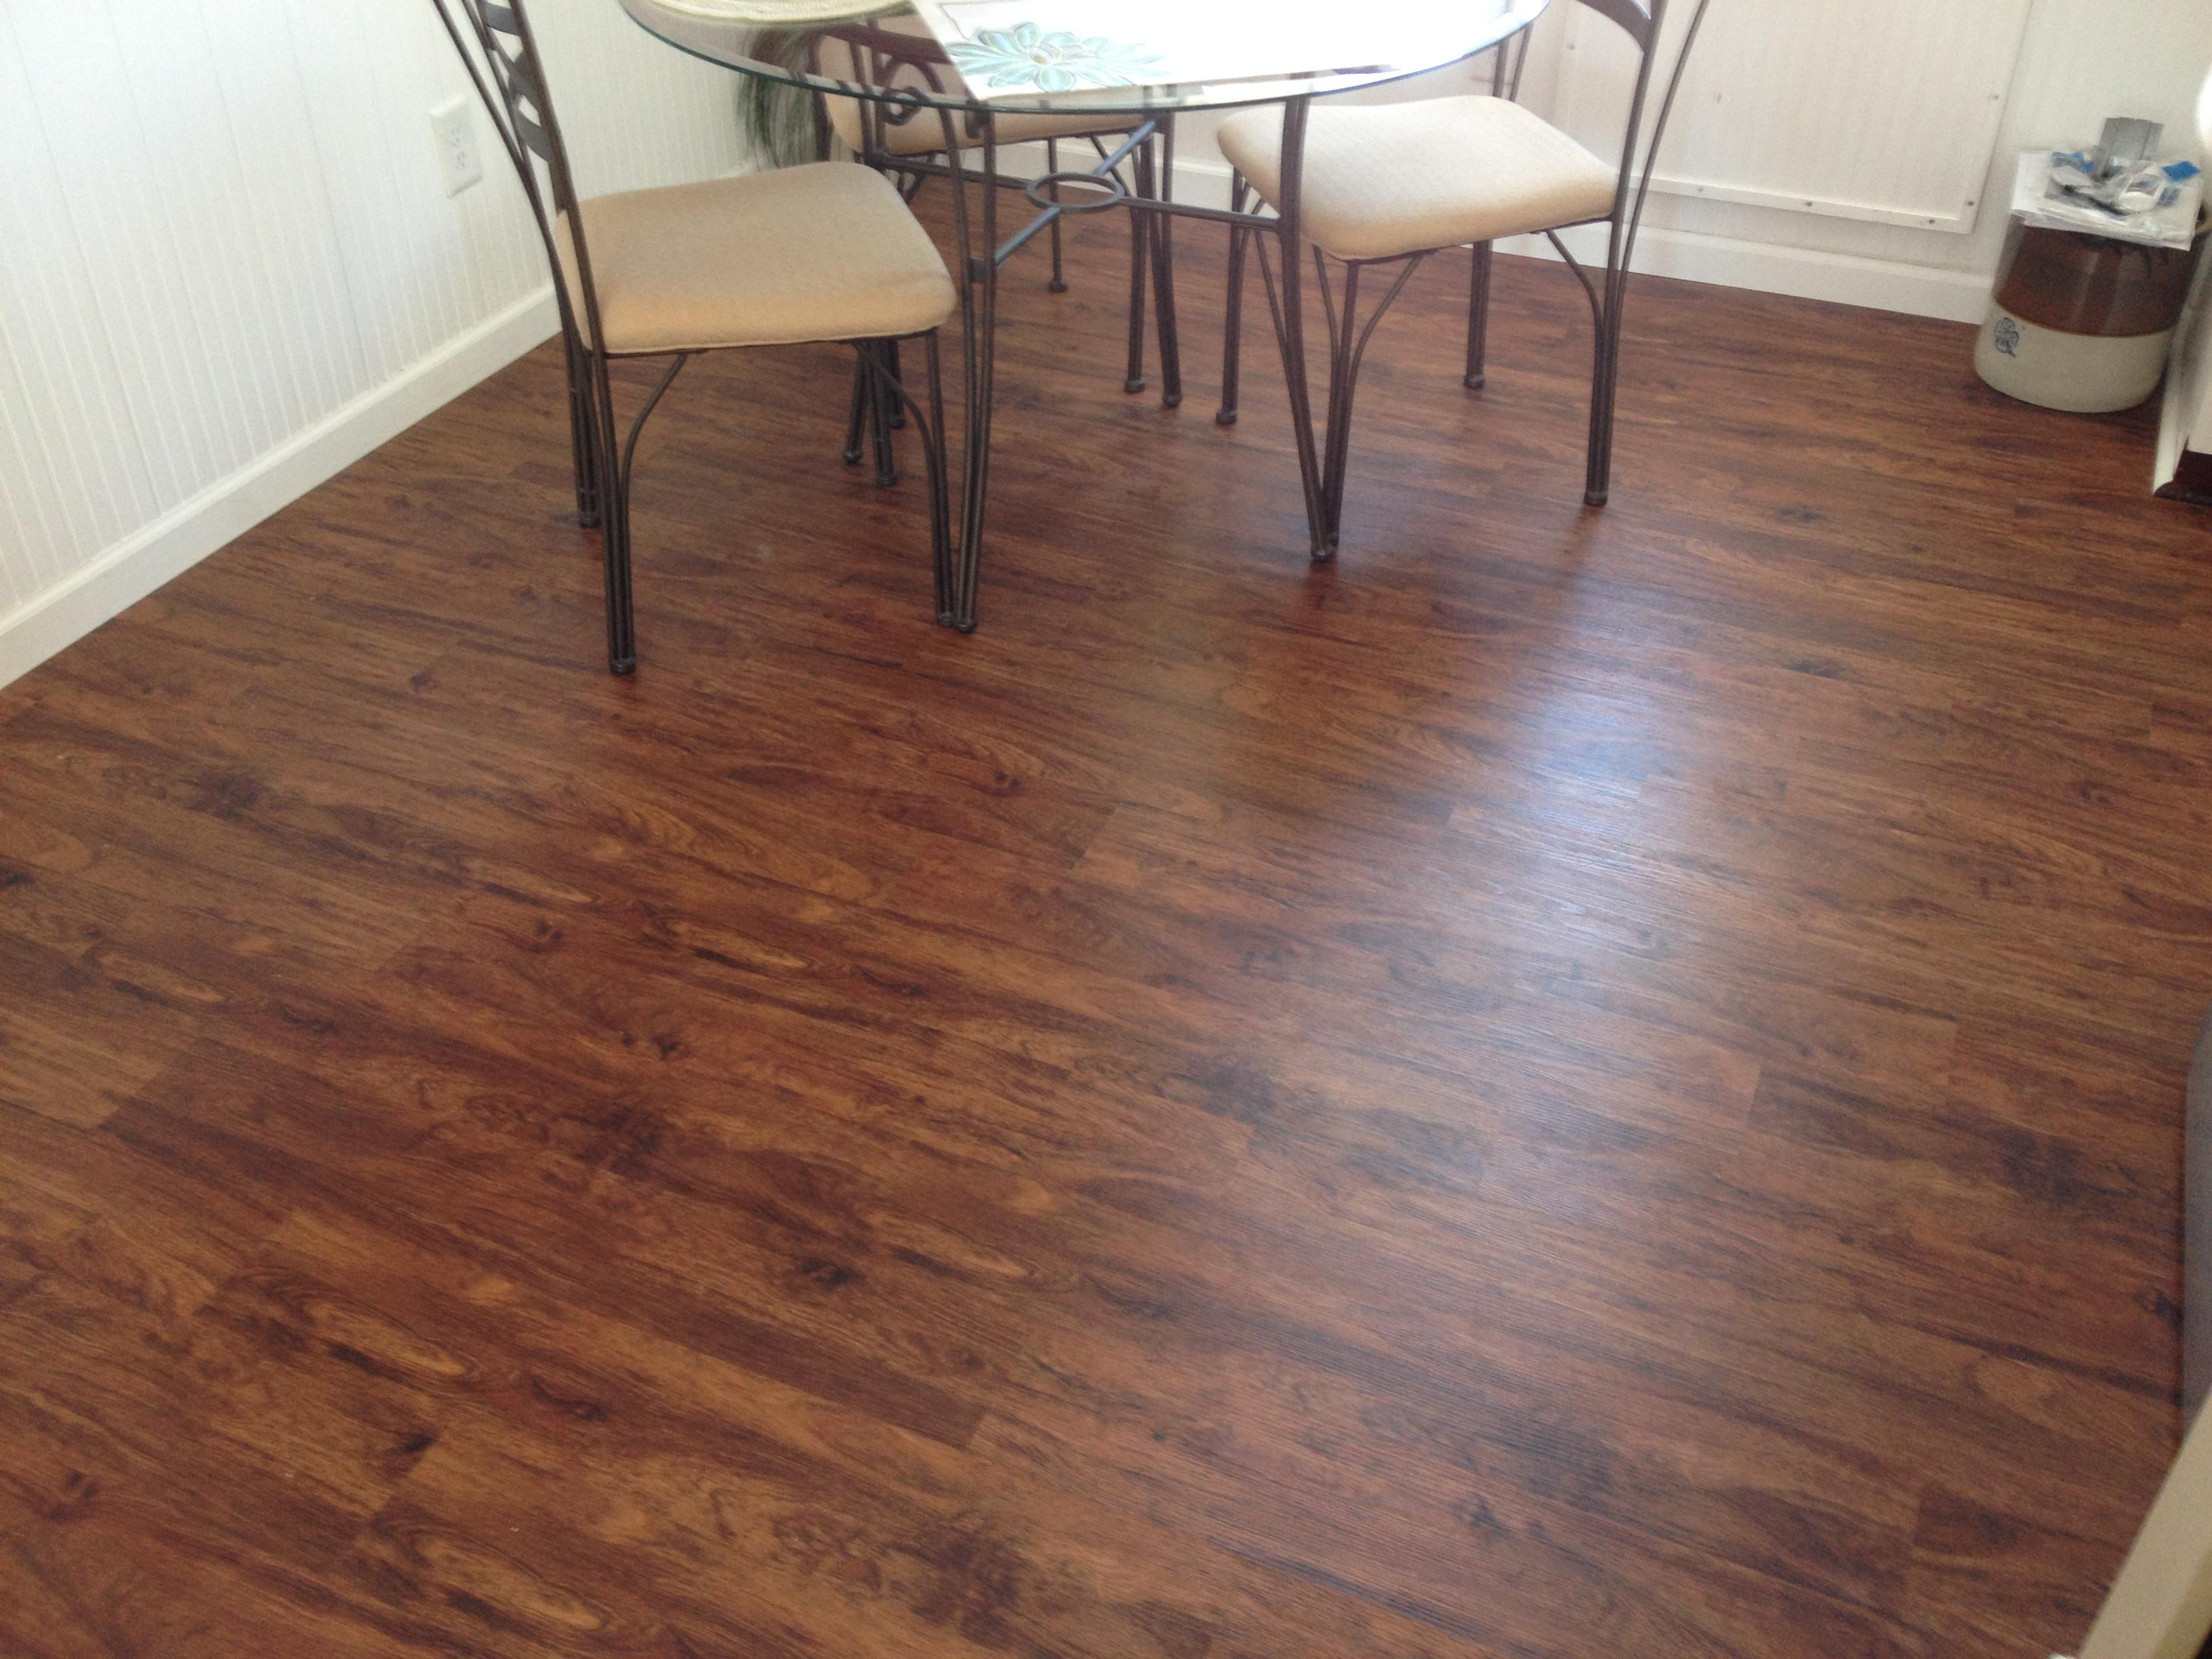 flooring vinyl plank ... 30473510575 93158fabce b vinyl plank flooring prices canada  installation on stairs PDUBJVV